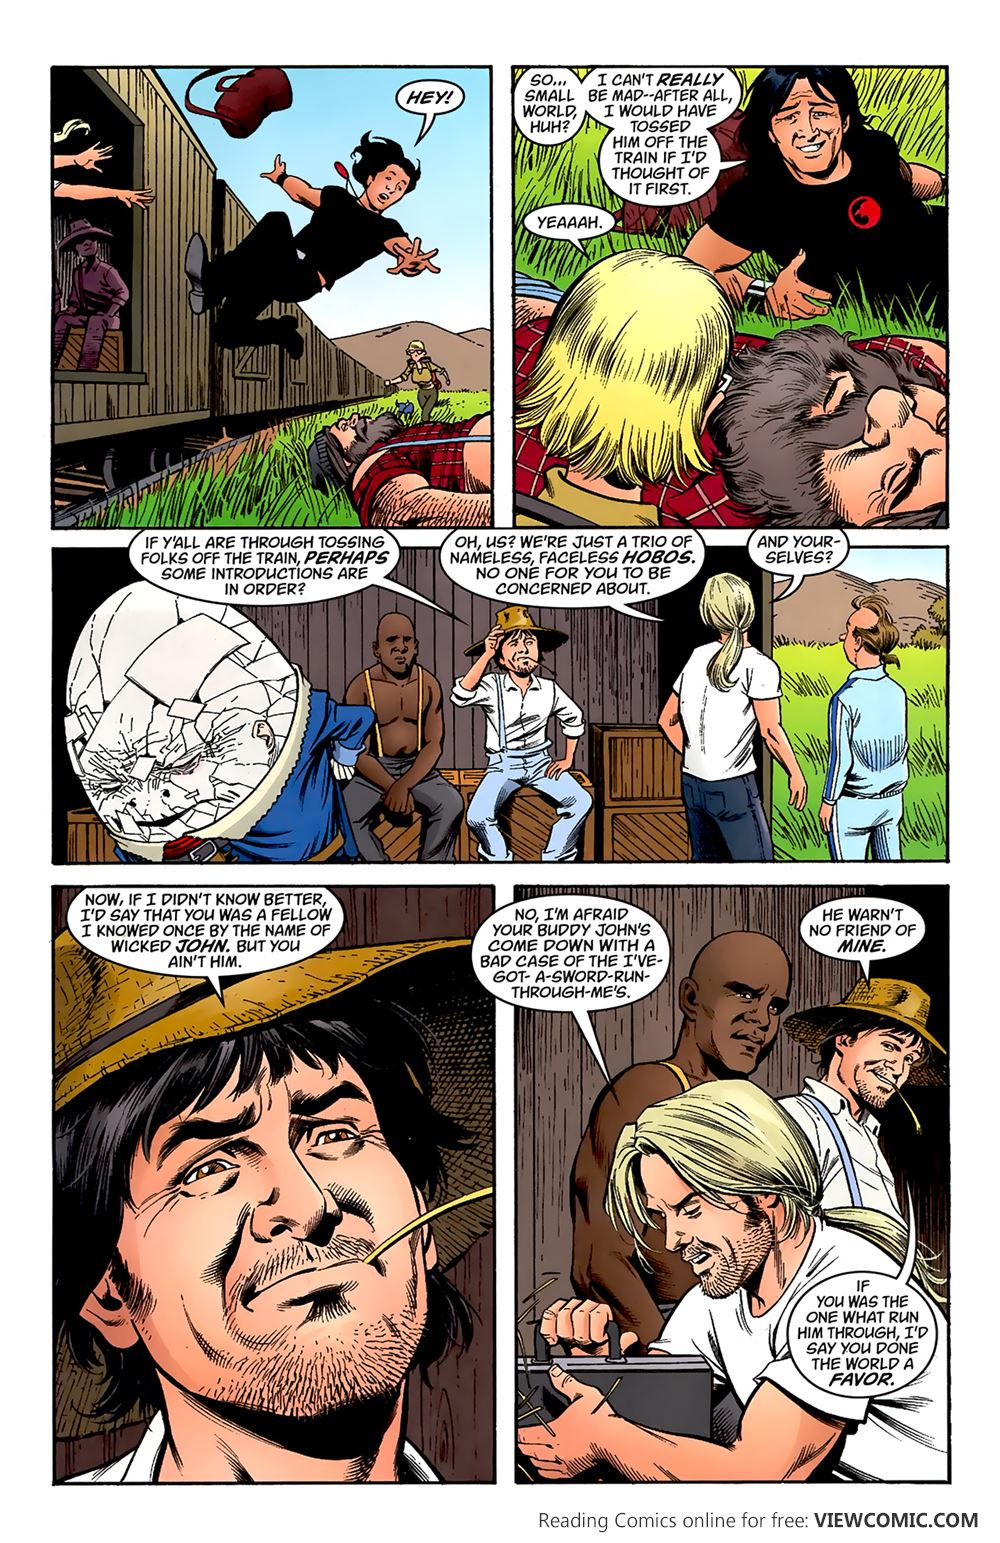 Jack of Fables 18 …………………………………… | Viewcomic reading comics